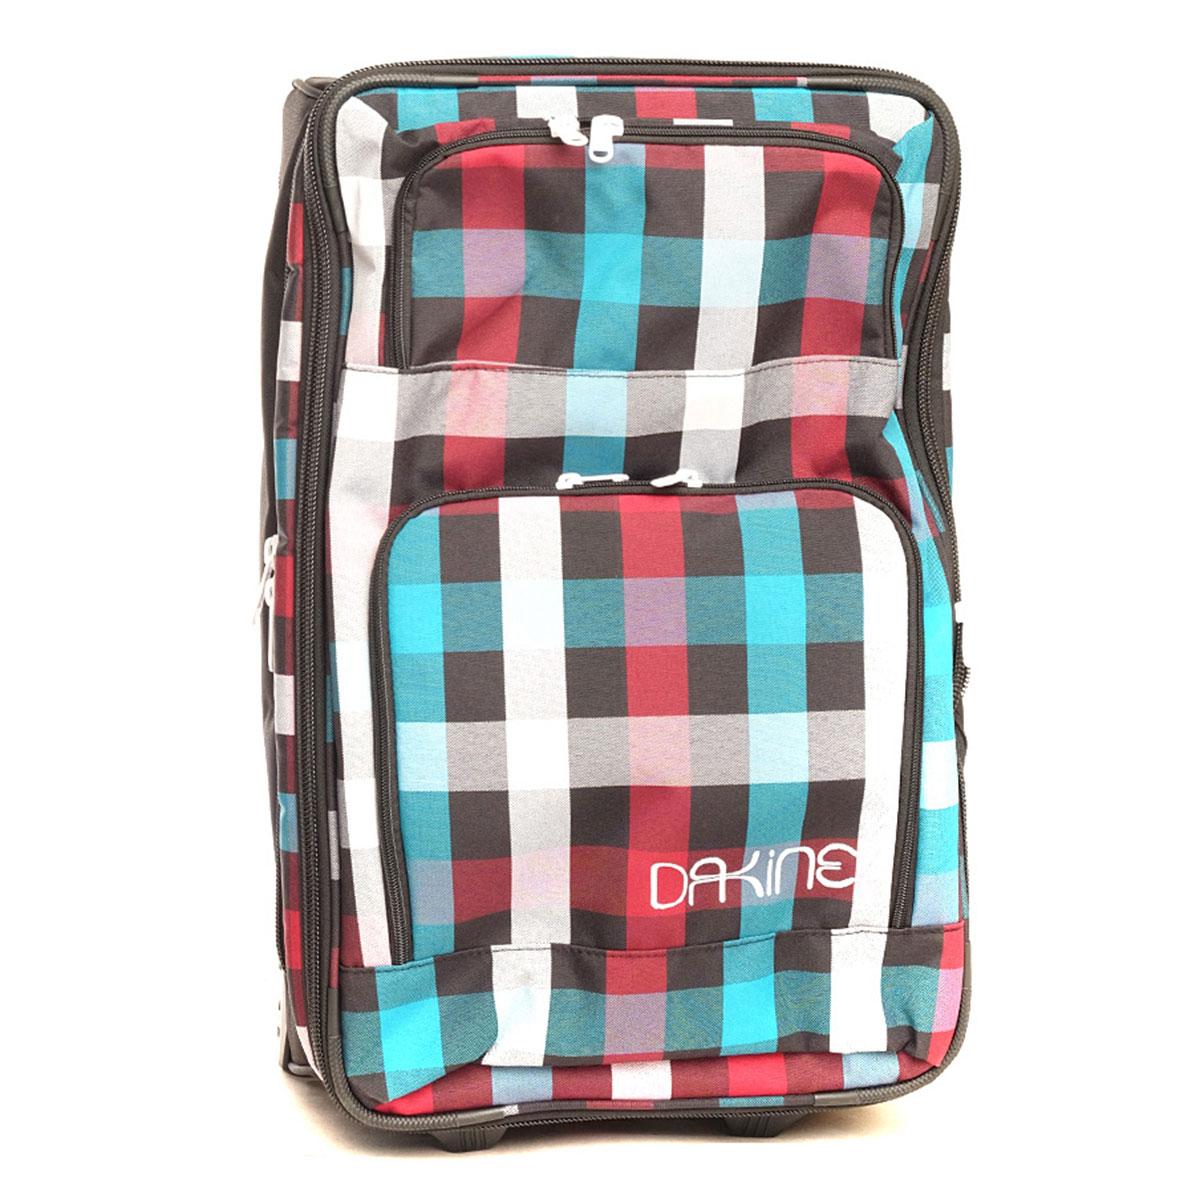 aed8add53843 Купить сумку дорожная Dakine Over/Under 64 L Highland в интернет ...